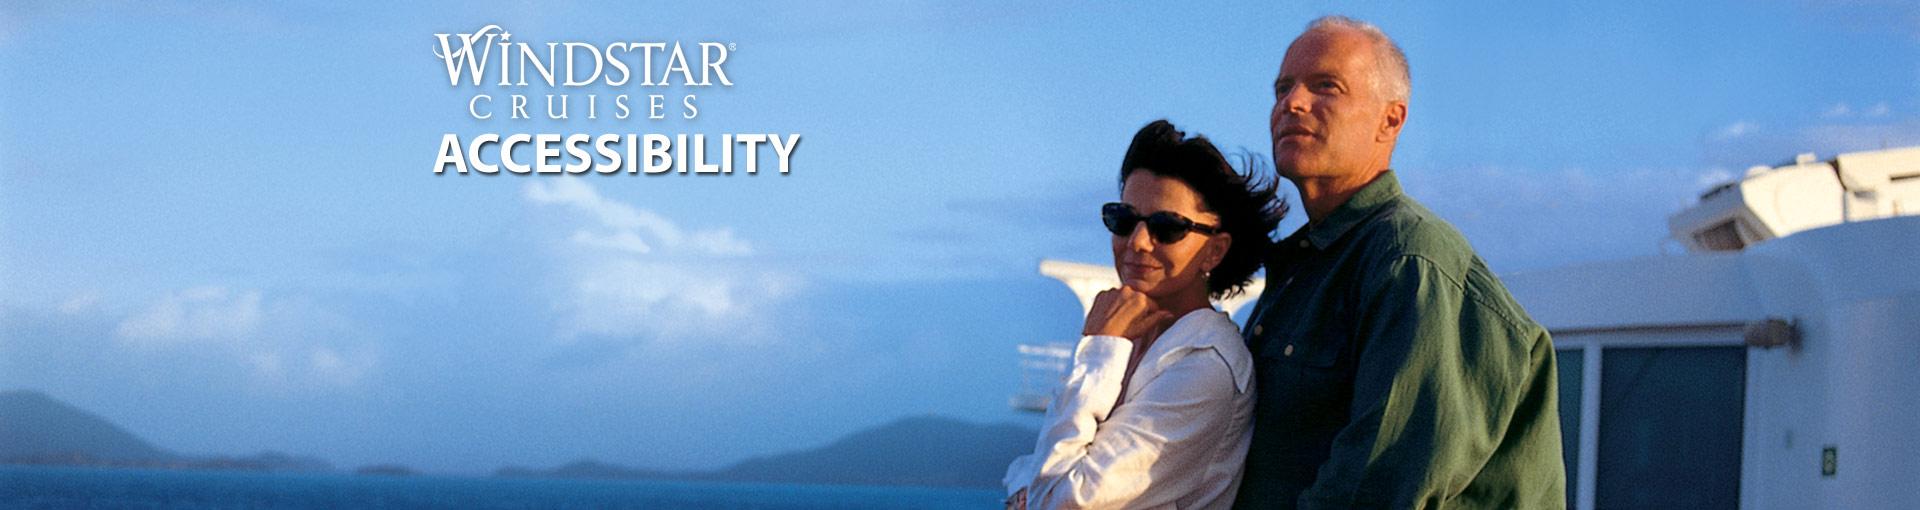 Windstar Cruises Accessibility